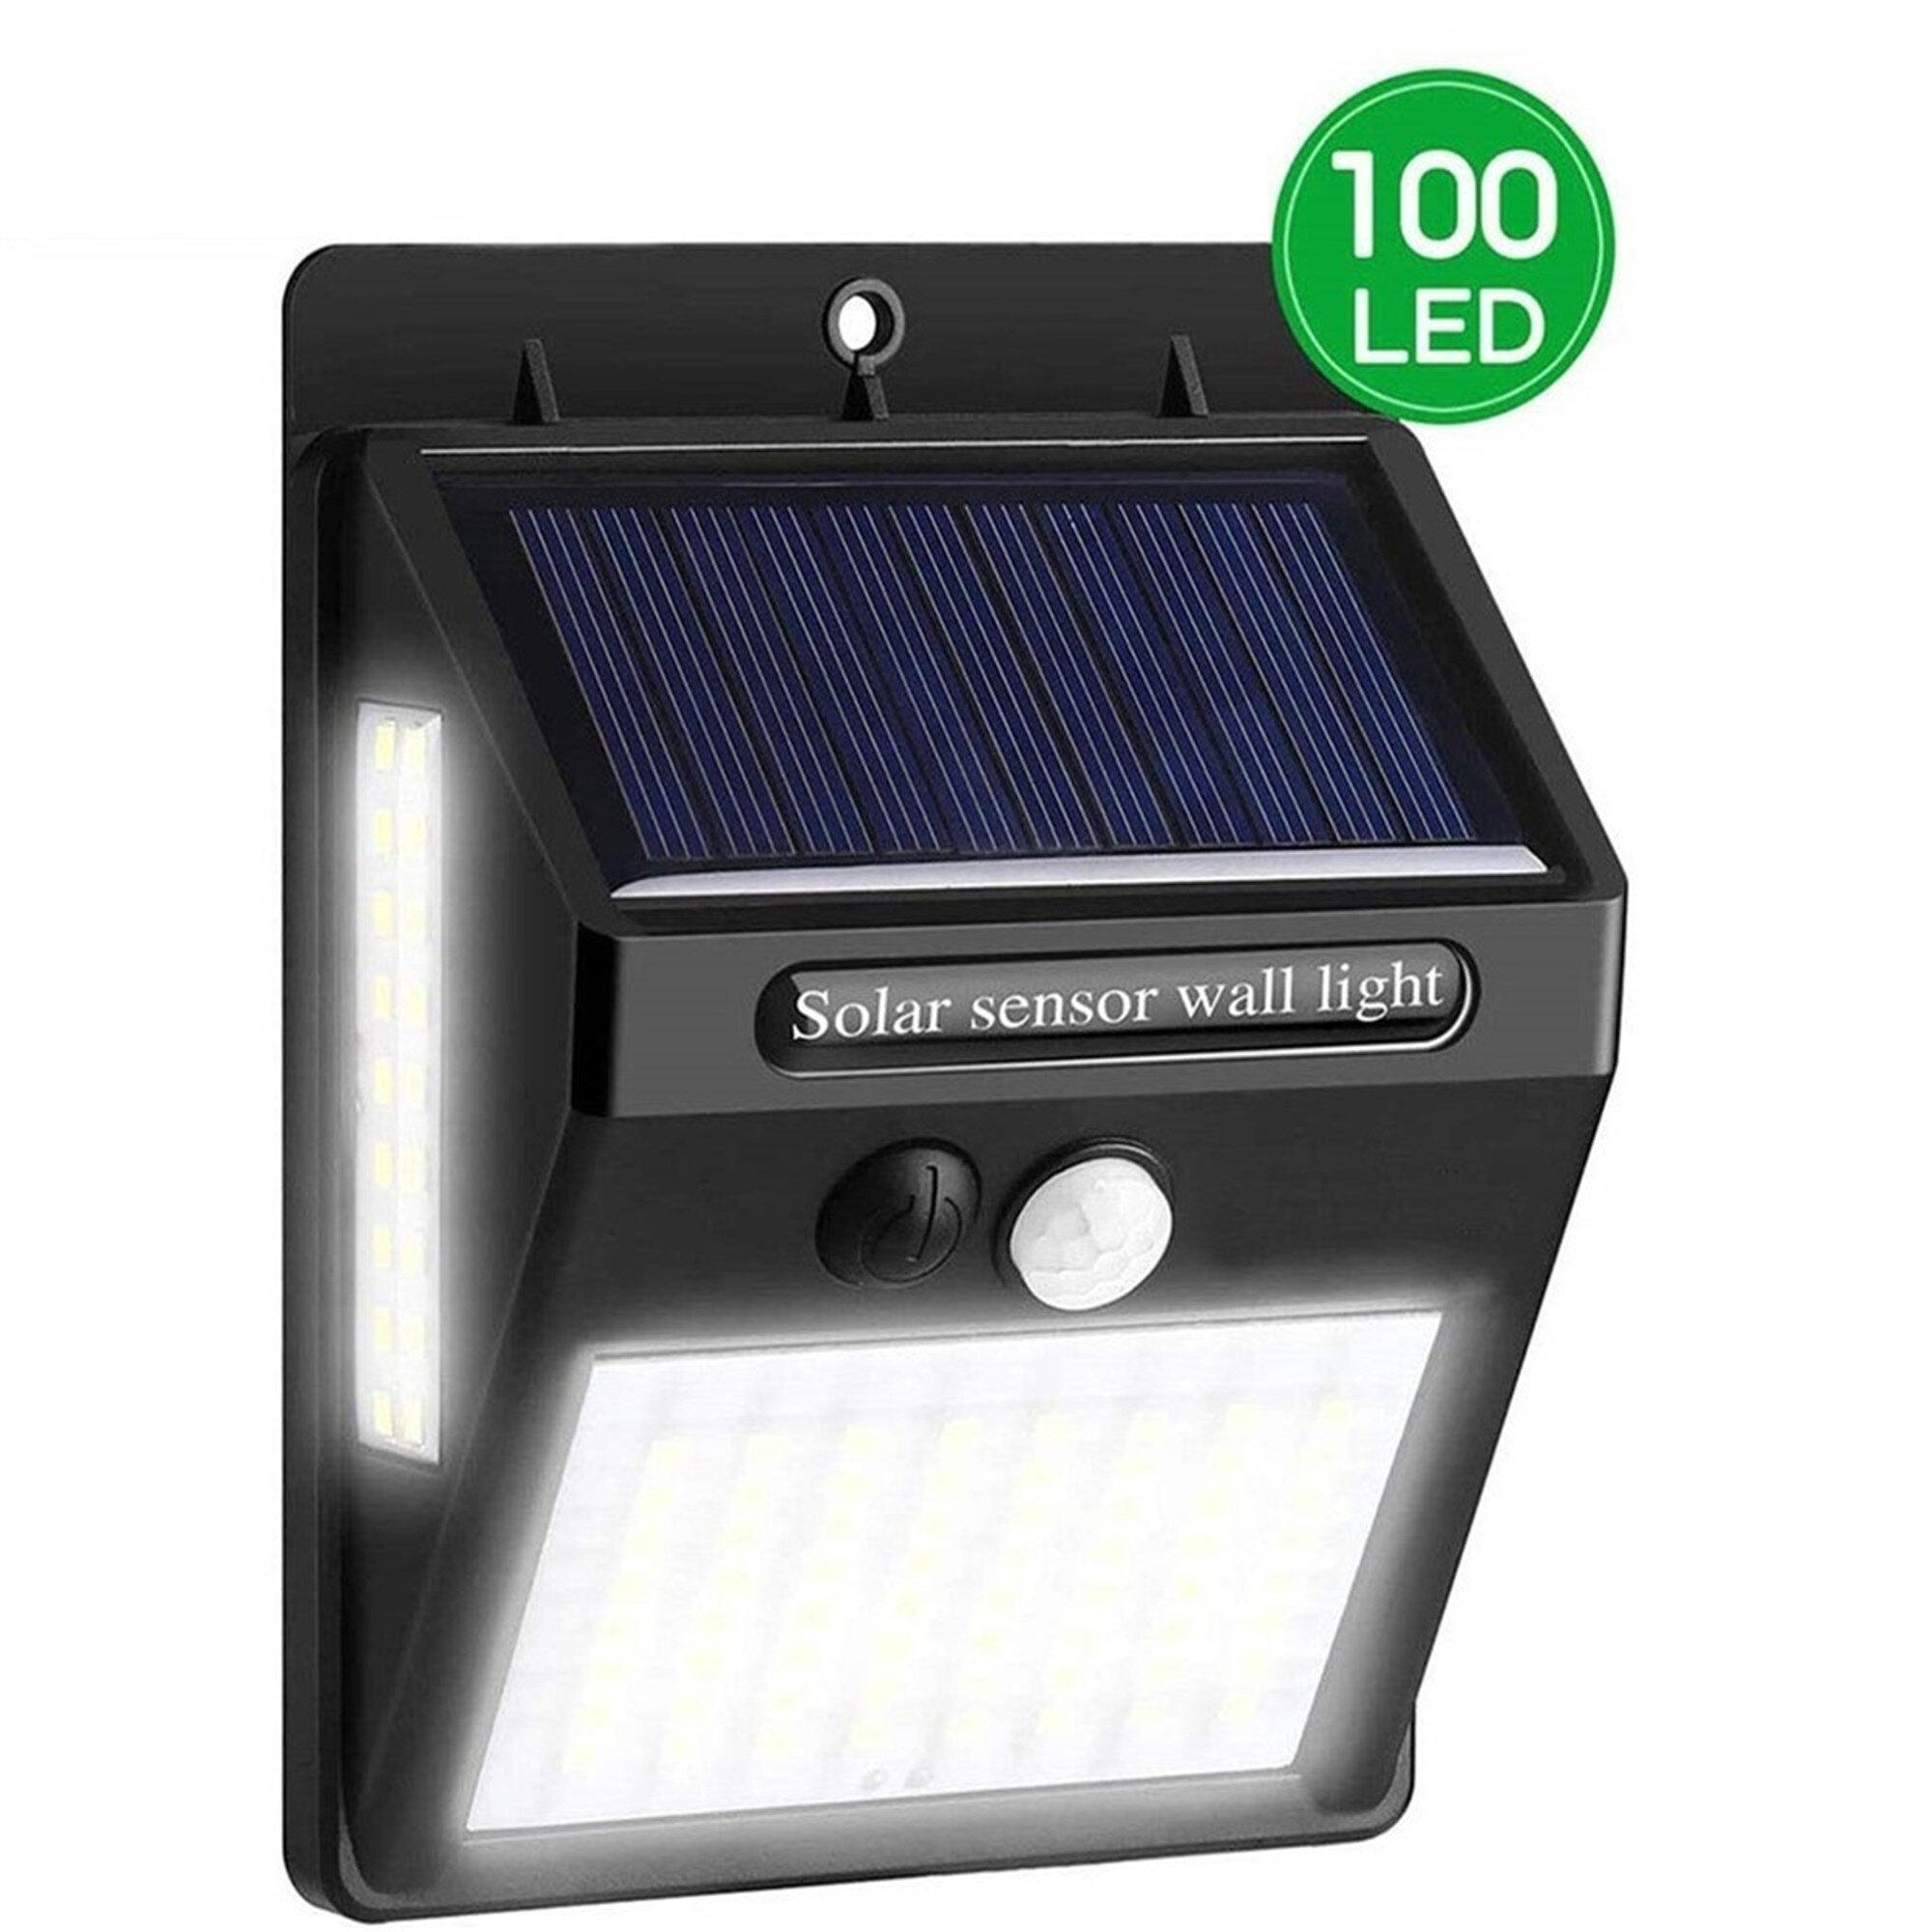 Linkpal 0 005 Watt Led Solar Power Dusk To Dawn Outdoor Security Wall Pack With Motion Sensor Wayfair